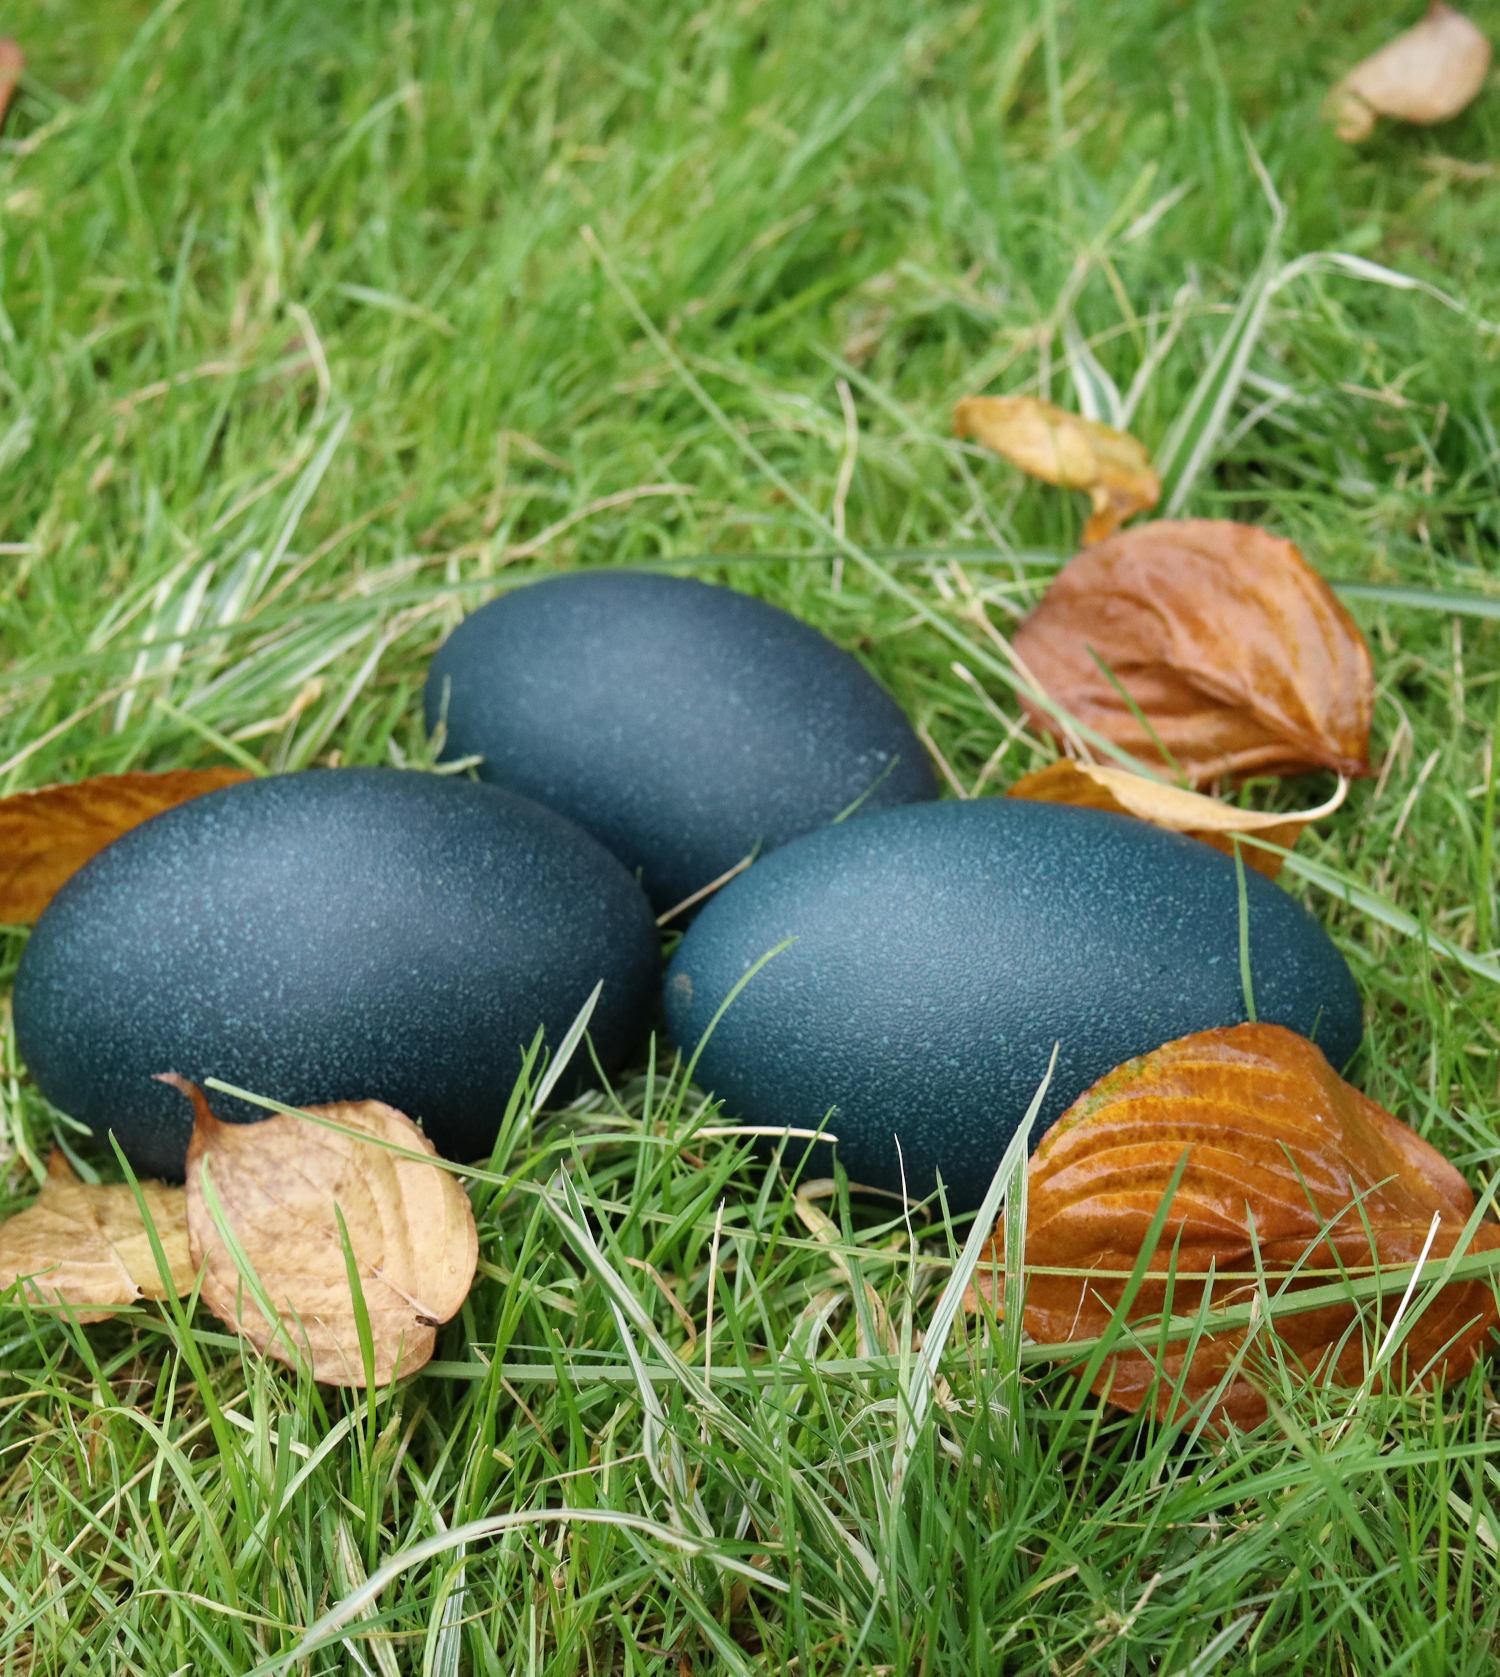 blue emus eggs